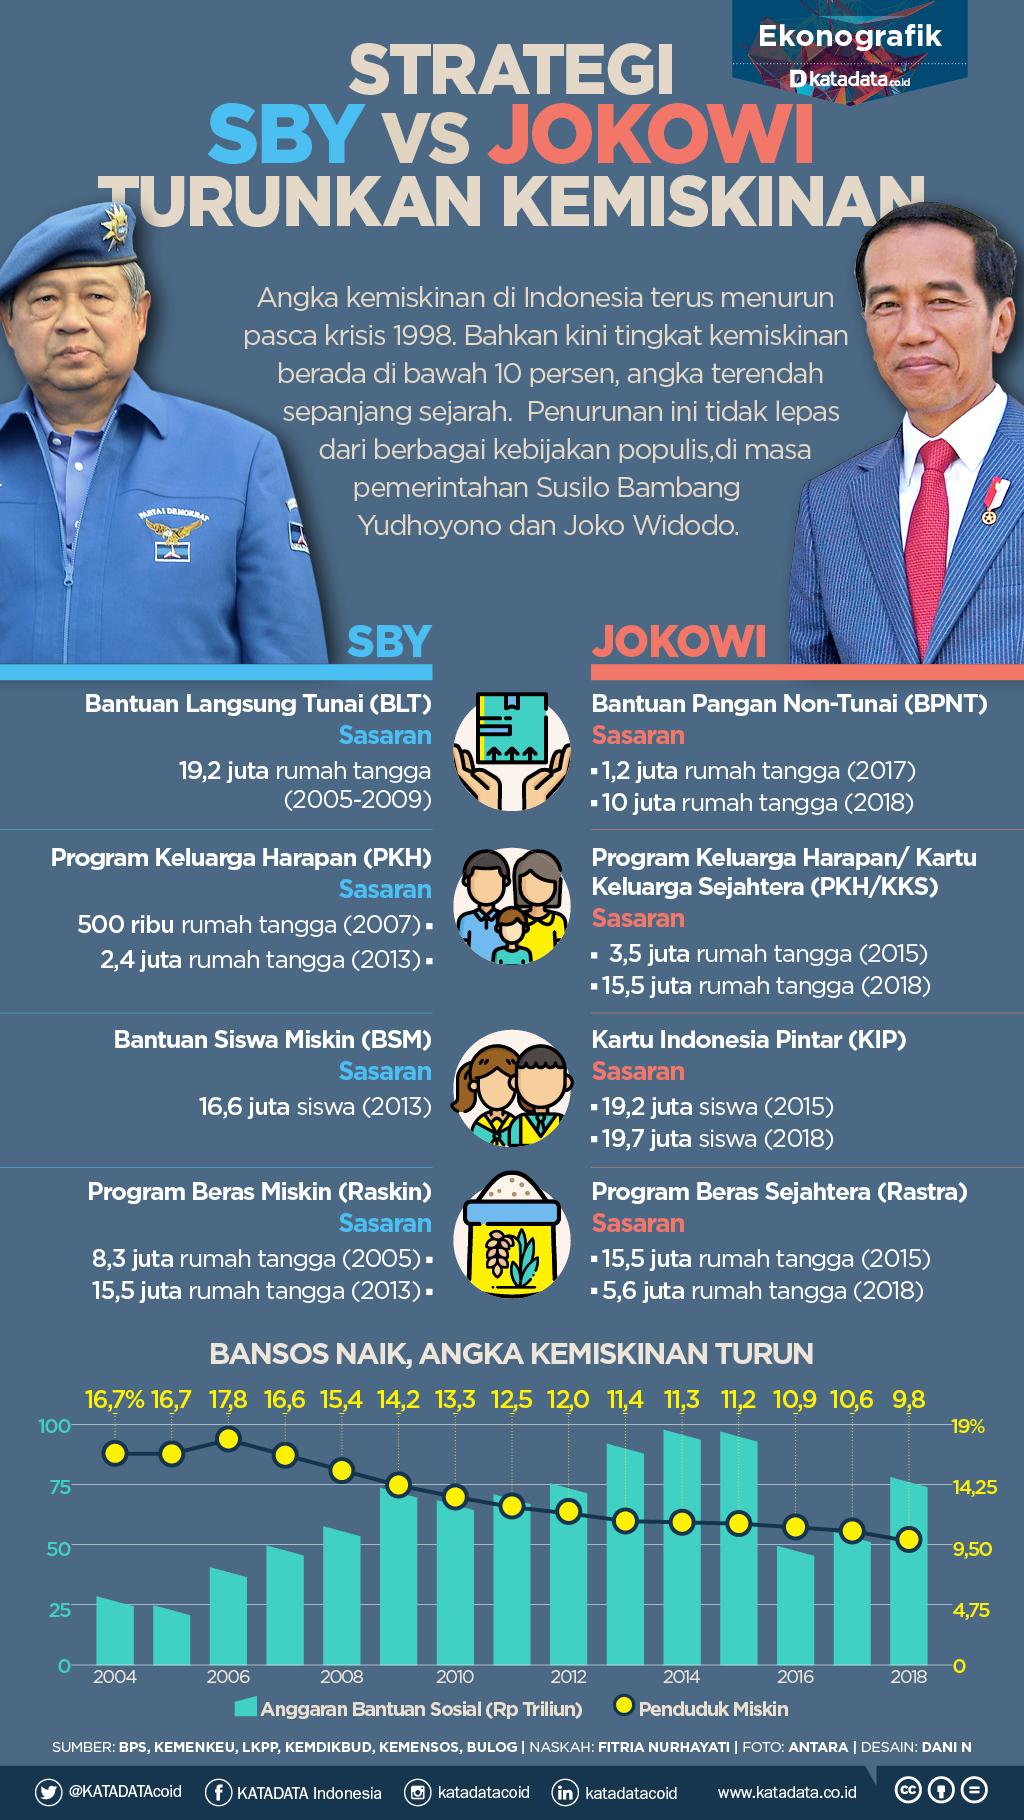 Strategi SBY Vs Jokowi Turunkan Kemiskinan